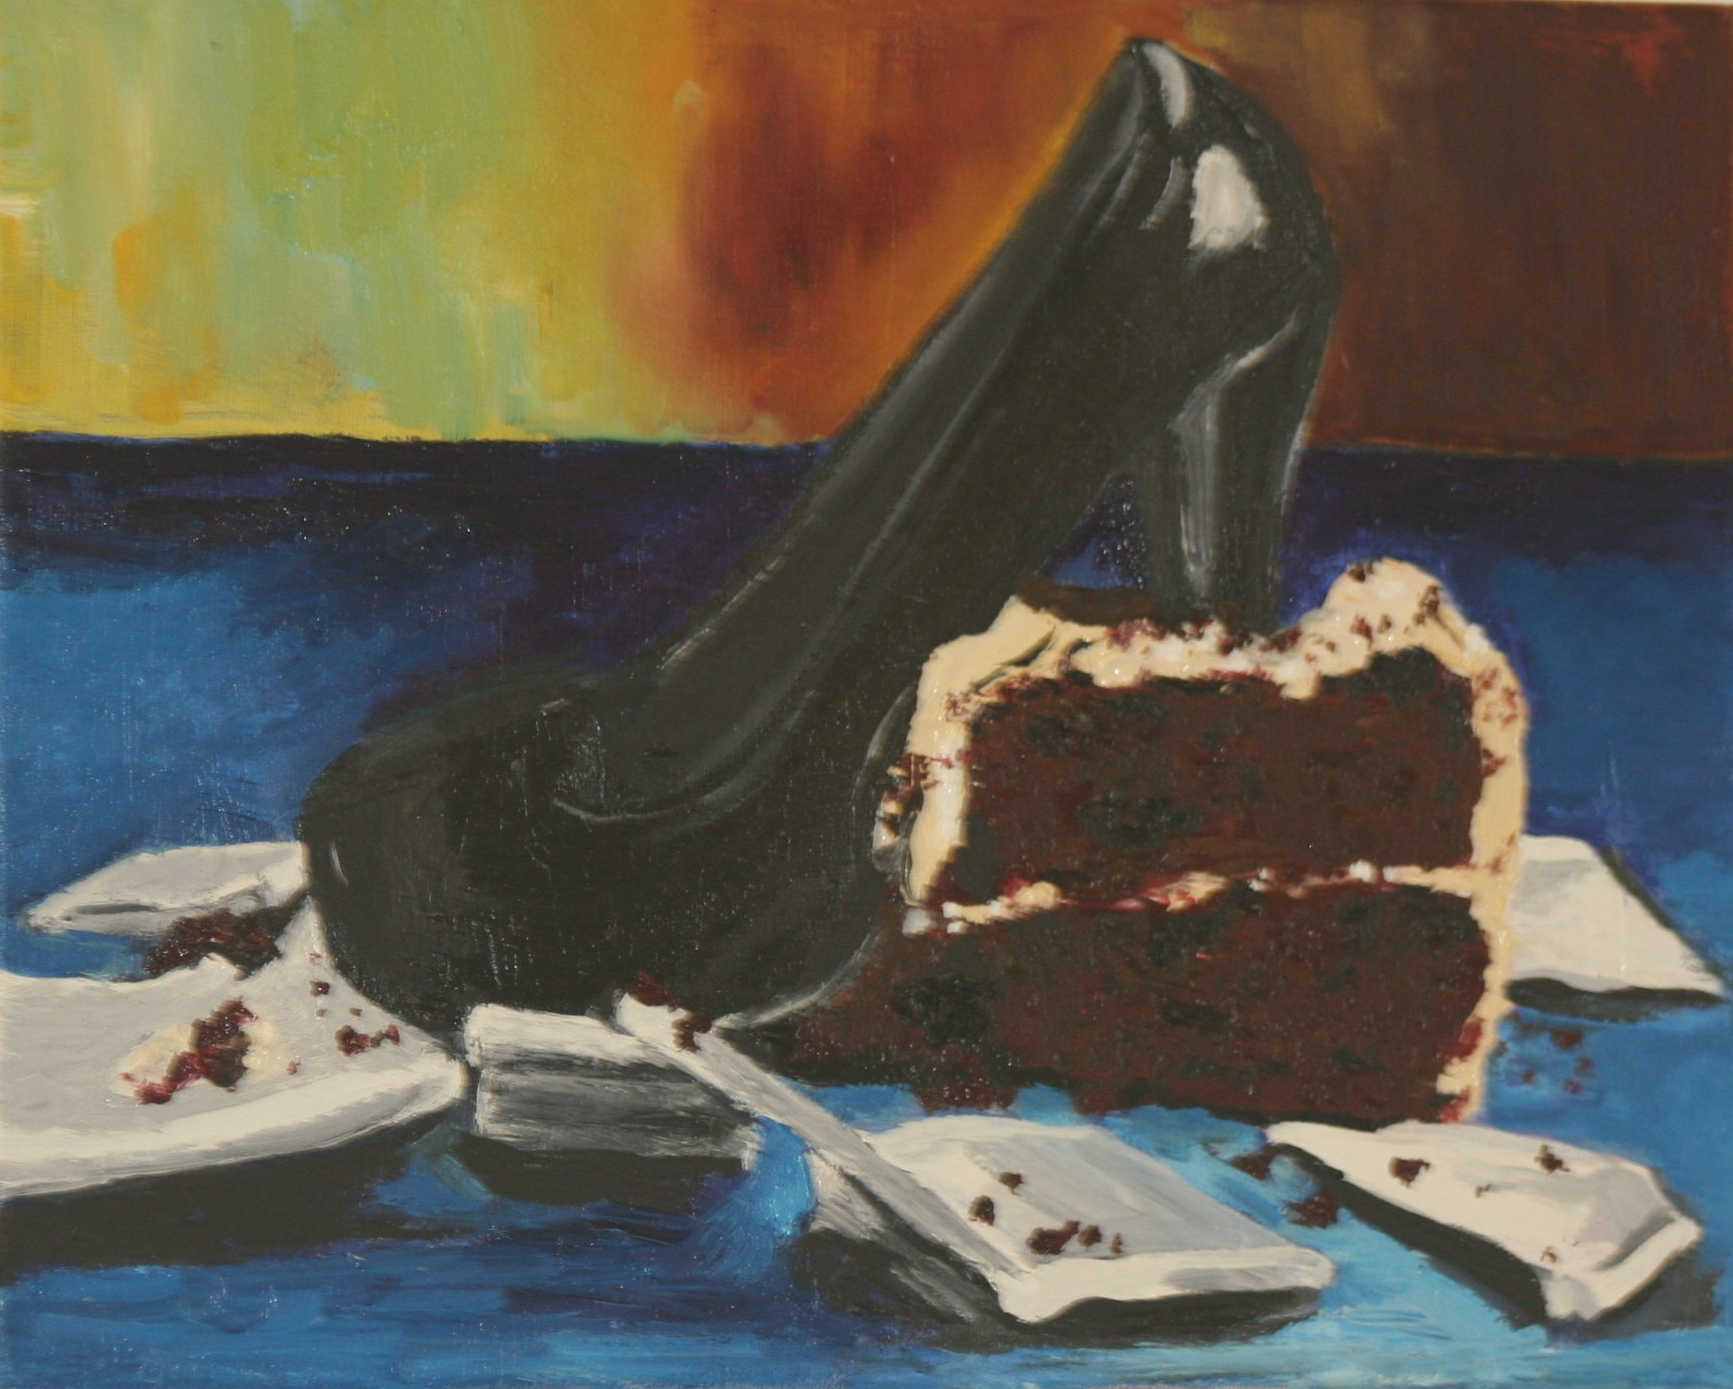 cake piece stomp